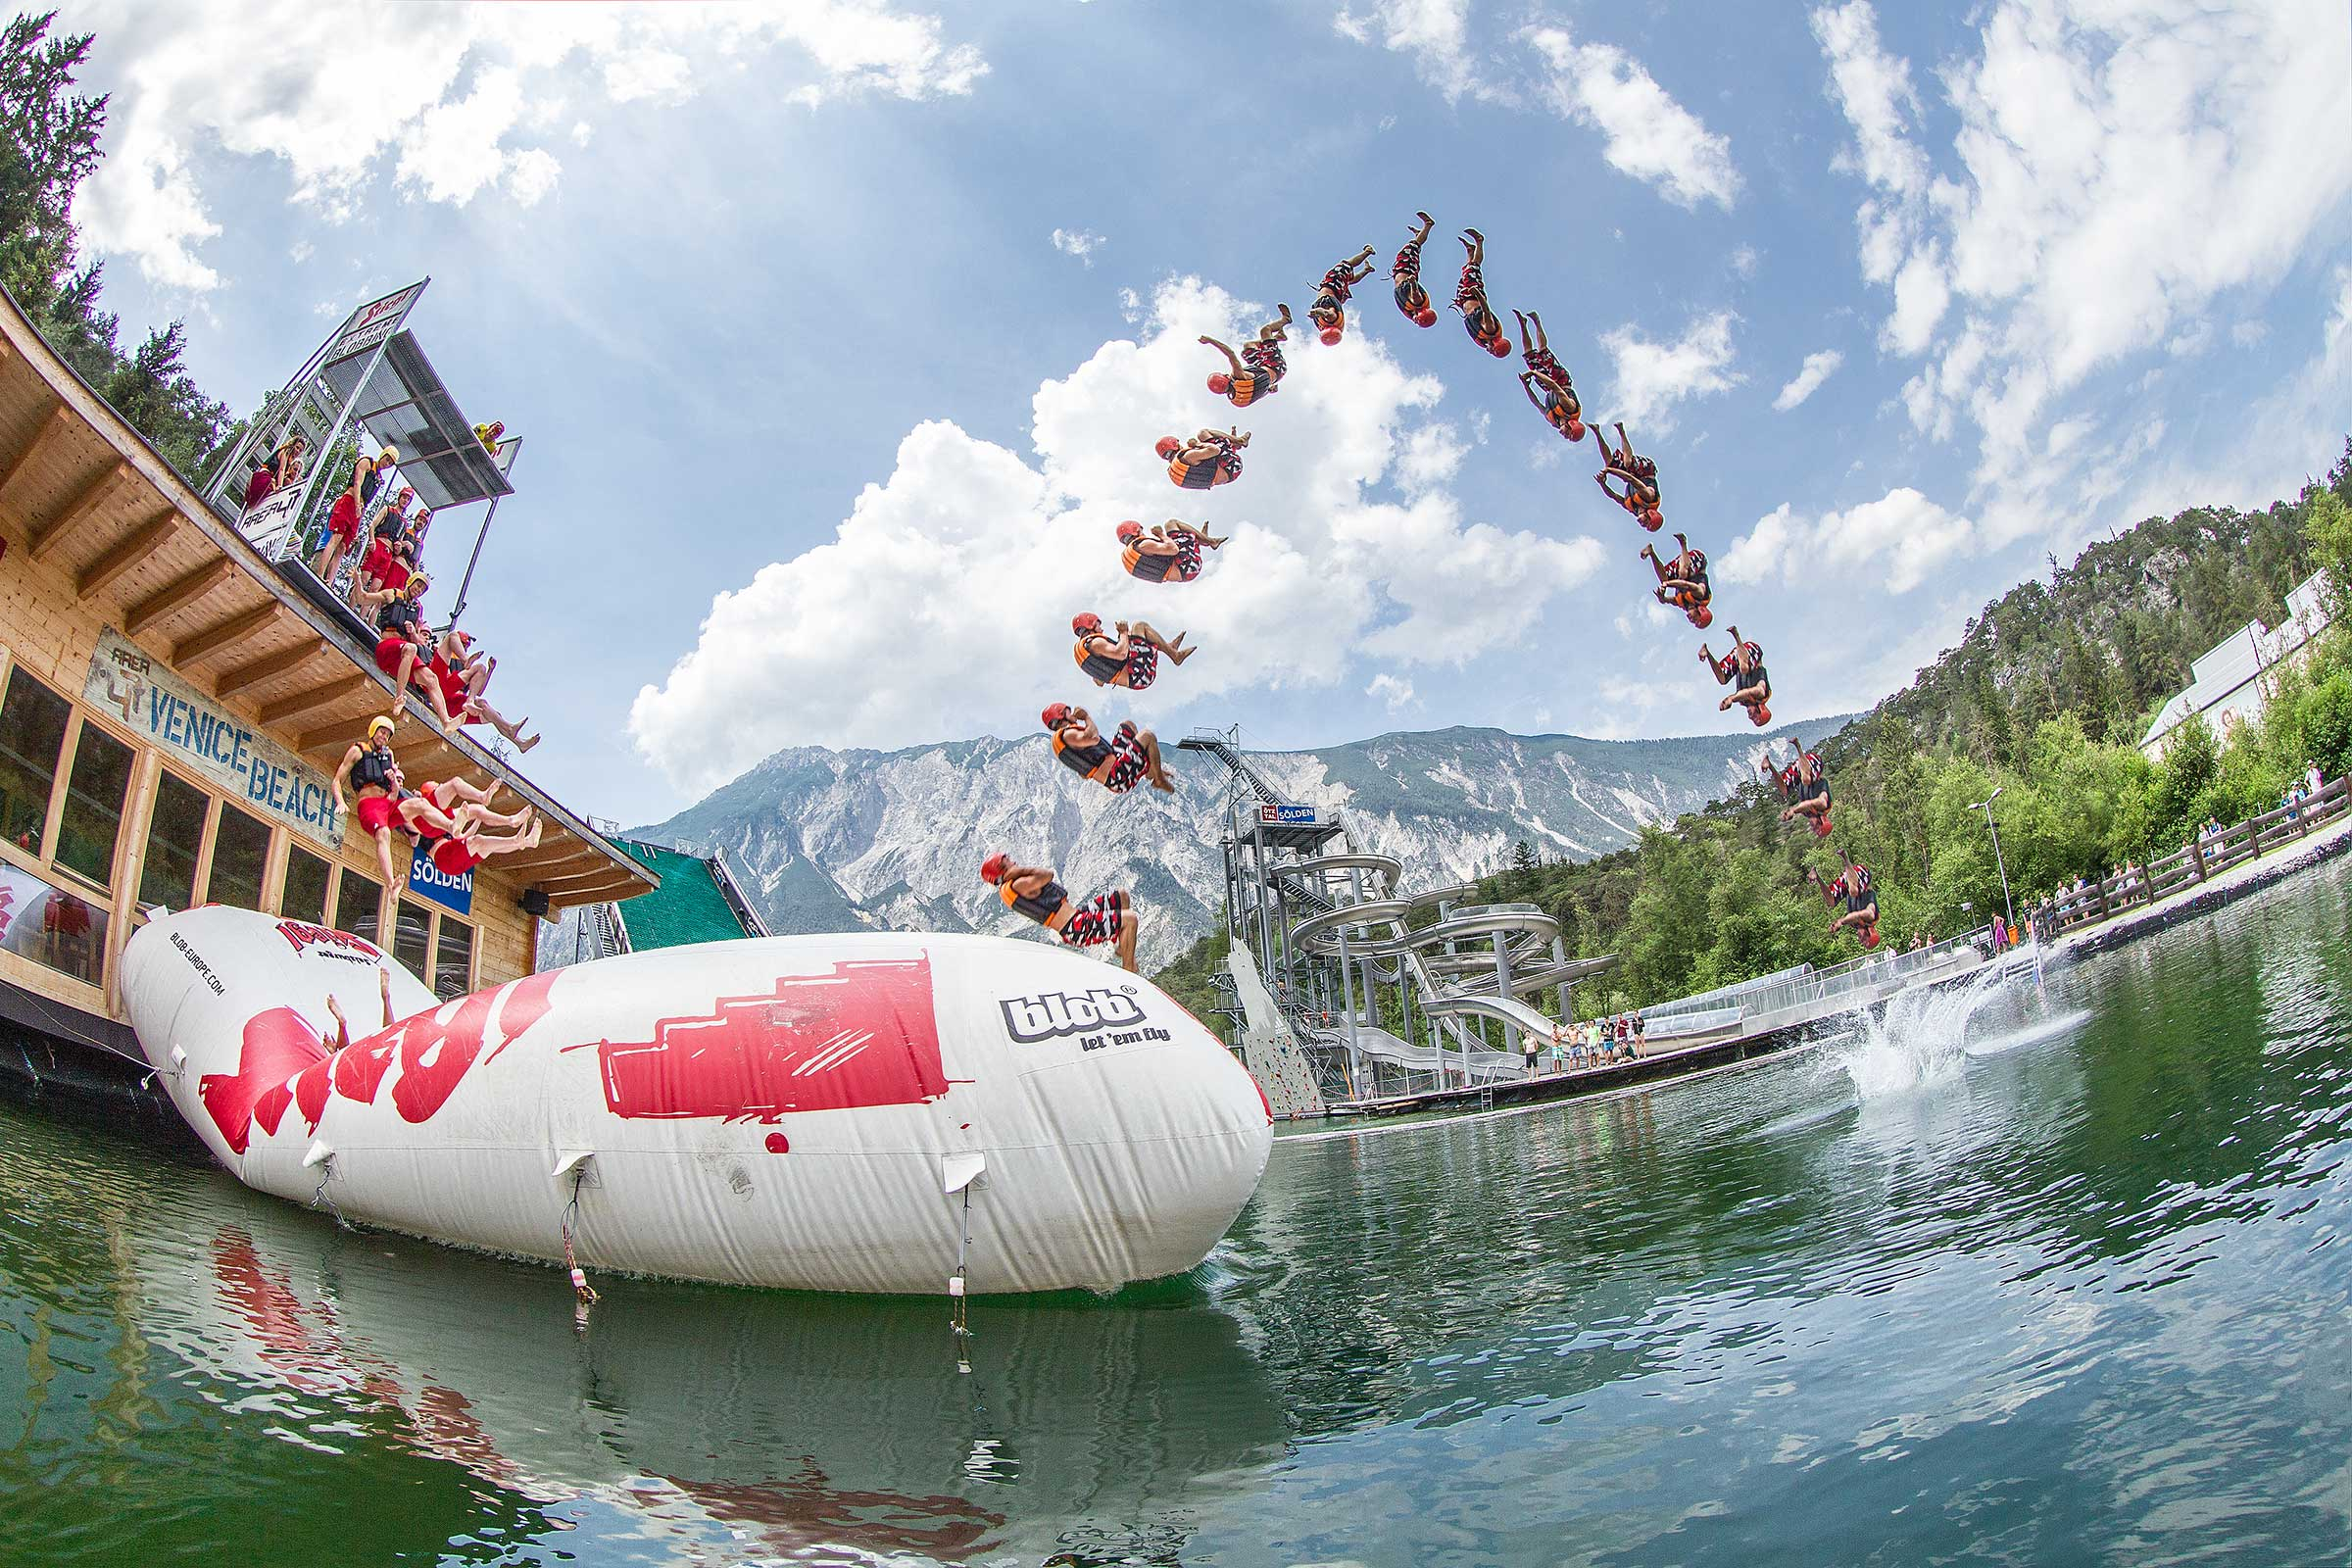 Blobbing in der AREA 47 - Rafting & Canyoning Ötztal